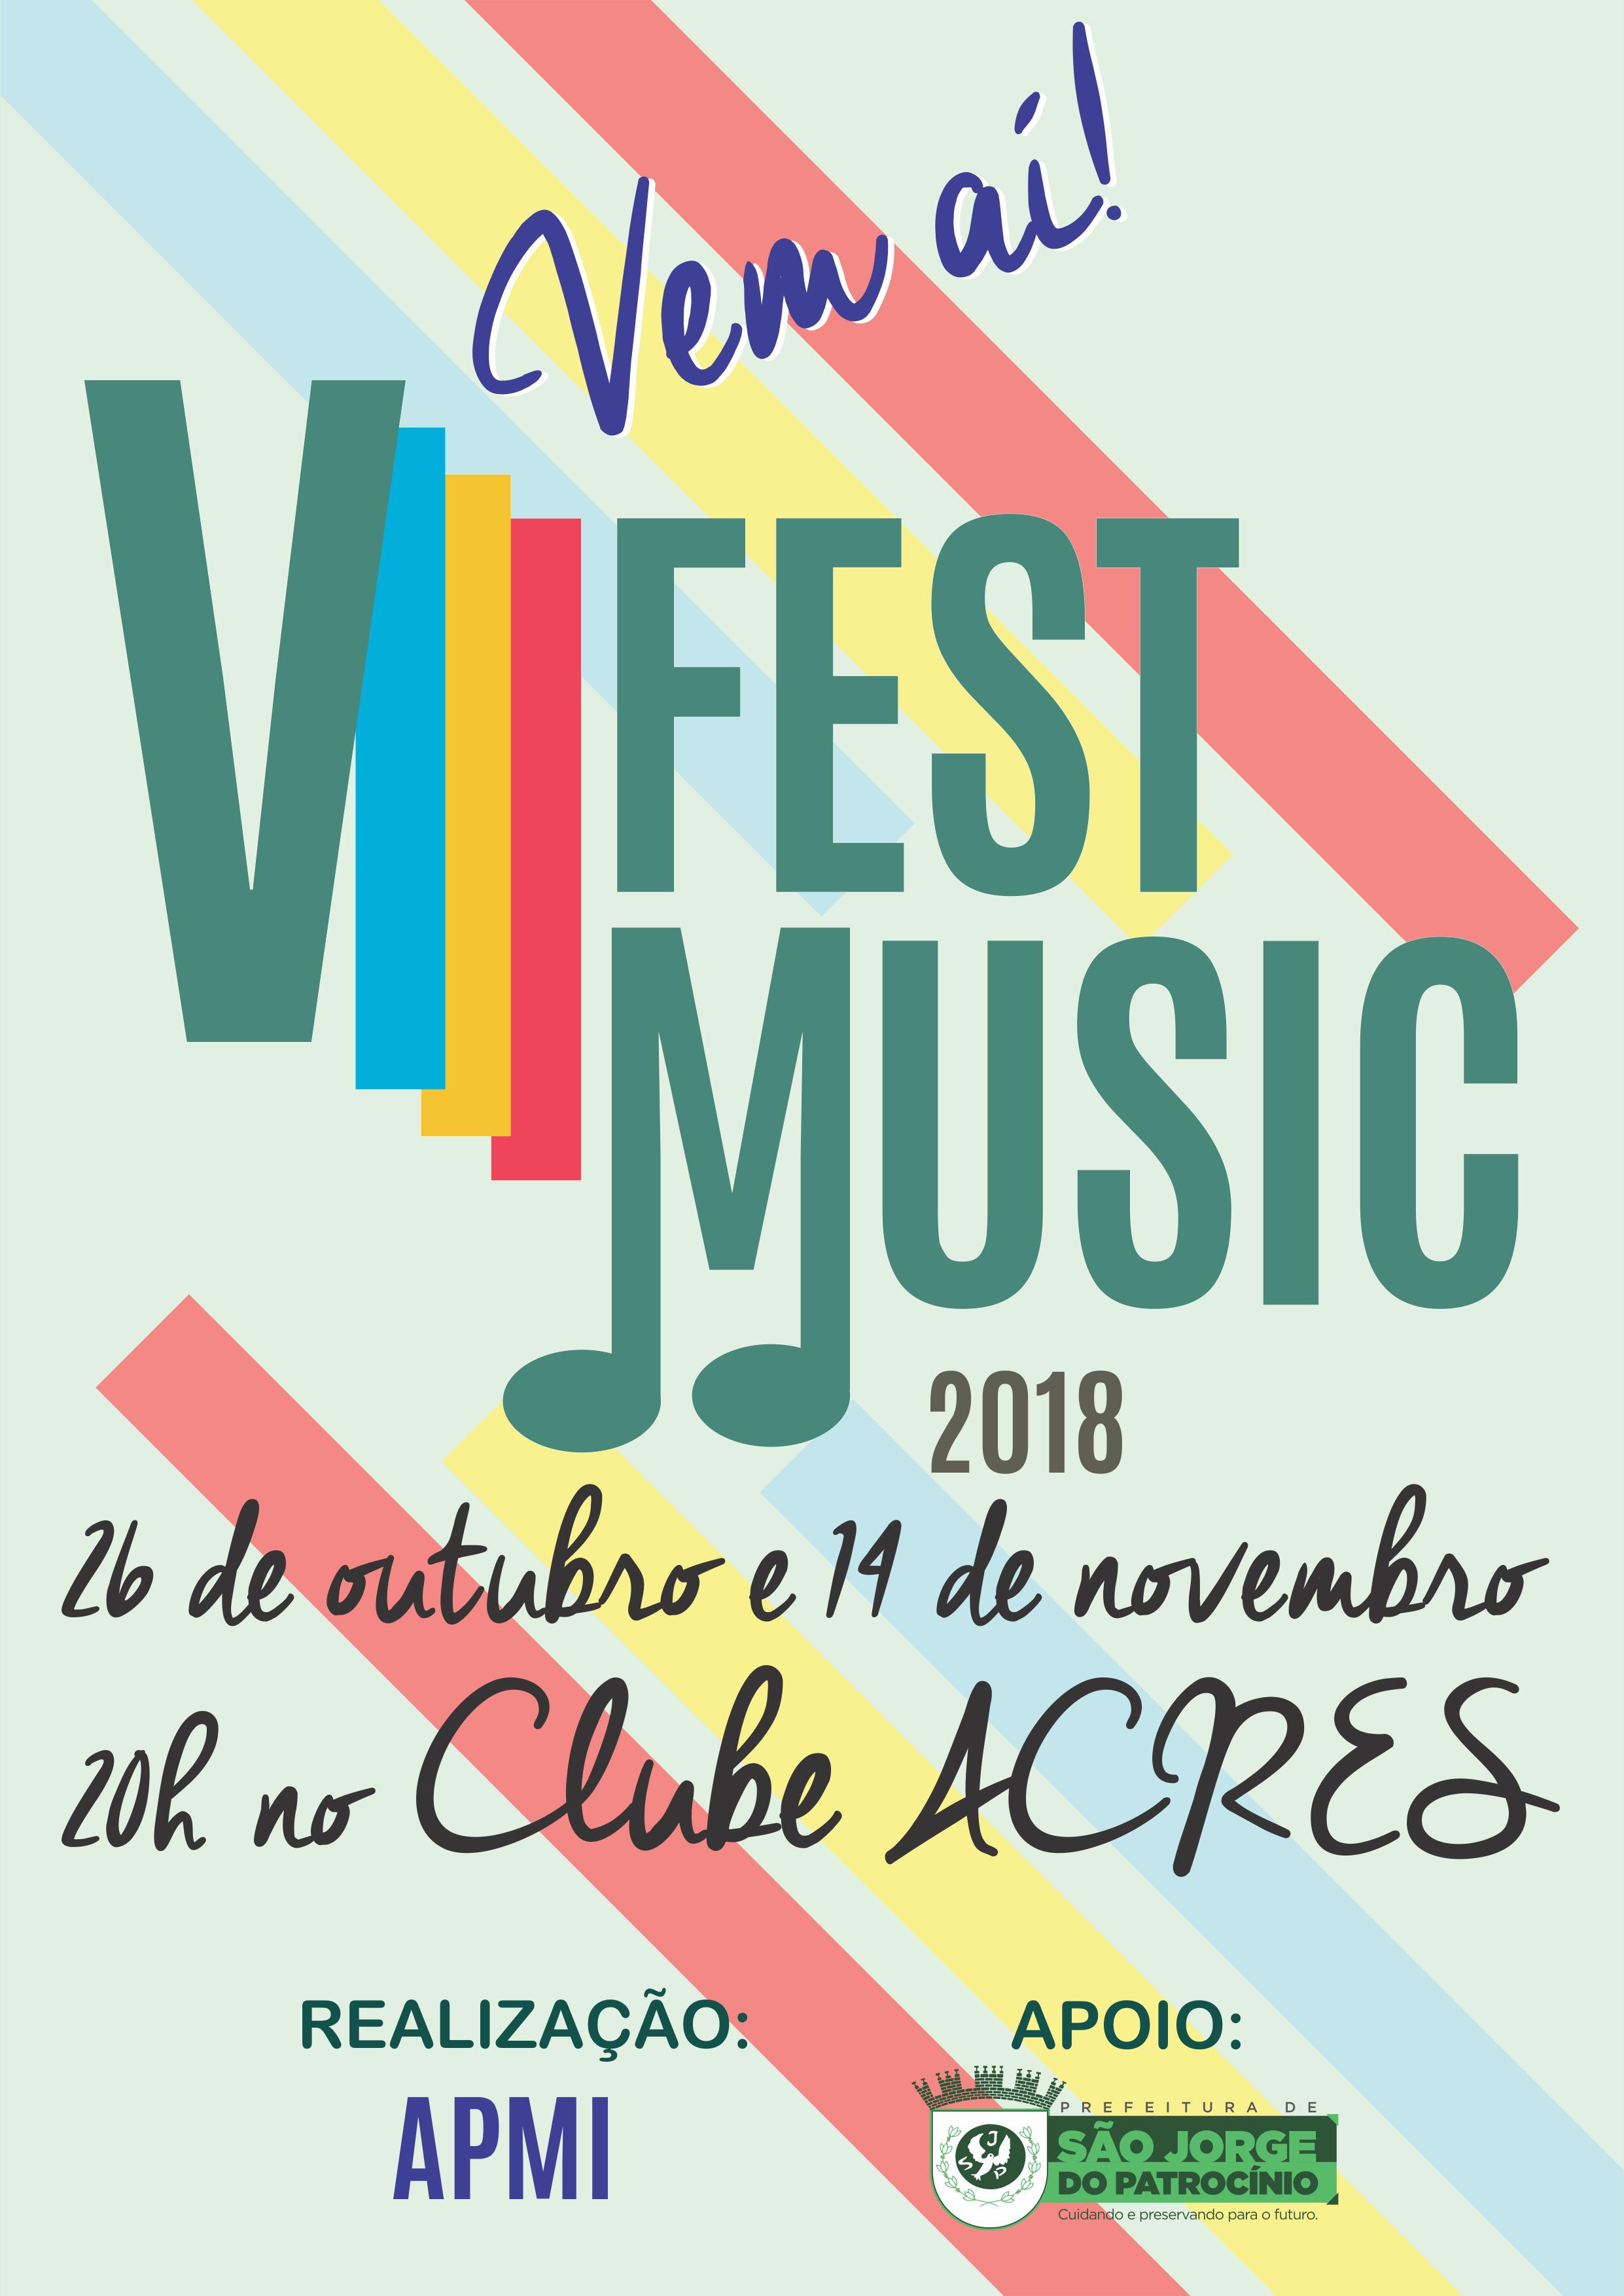 VIII FEST MUSIC PROMETE AGITAR SÃO JORGE DO PATROCÍNIO!!!